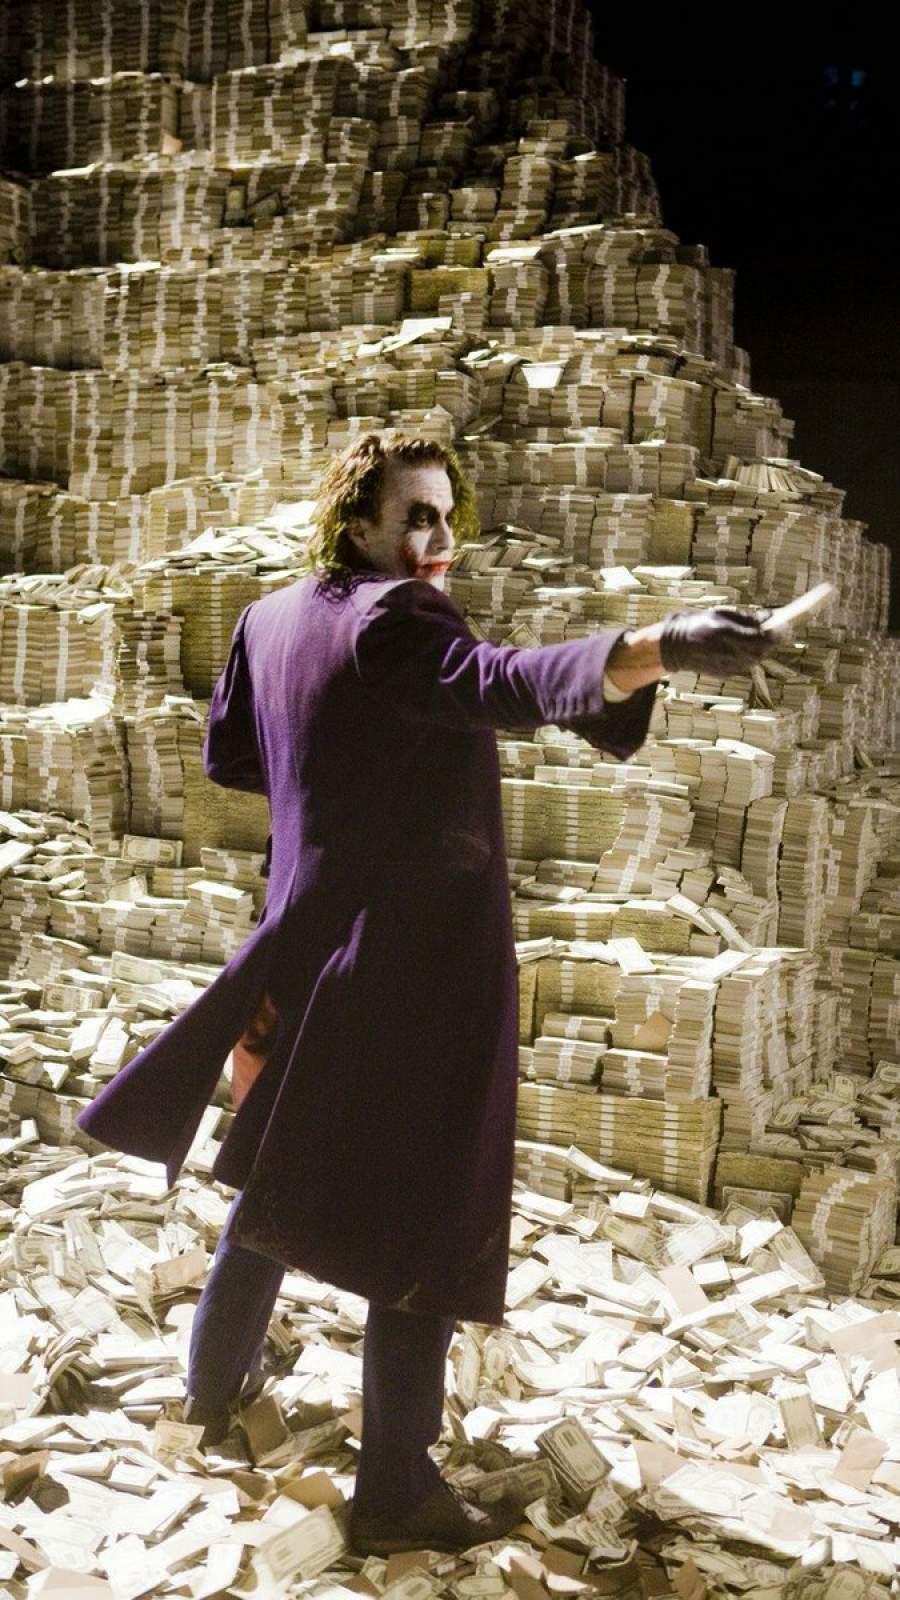 Joker with Money Wallpaper